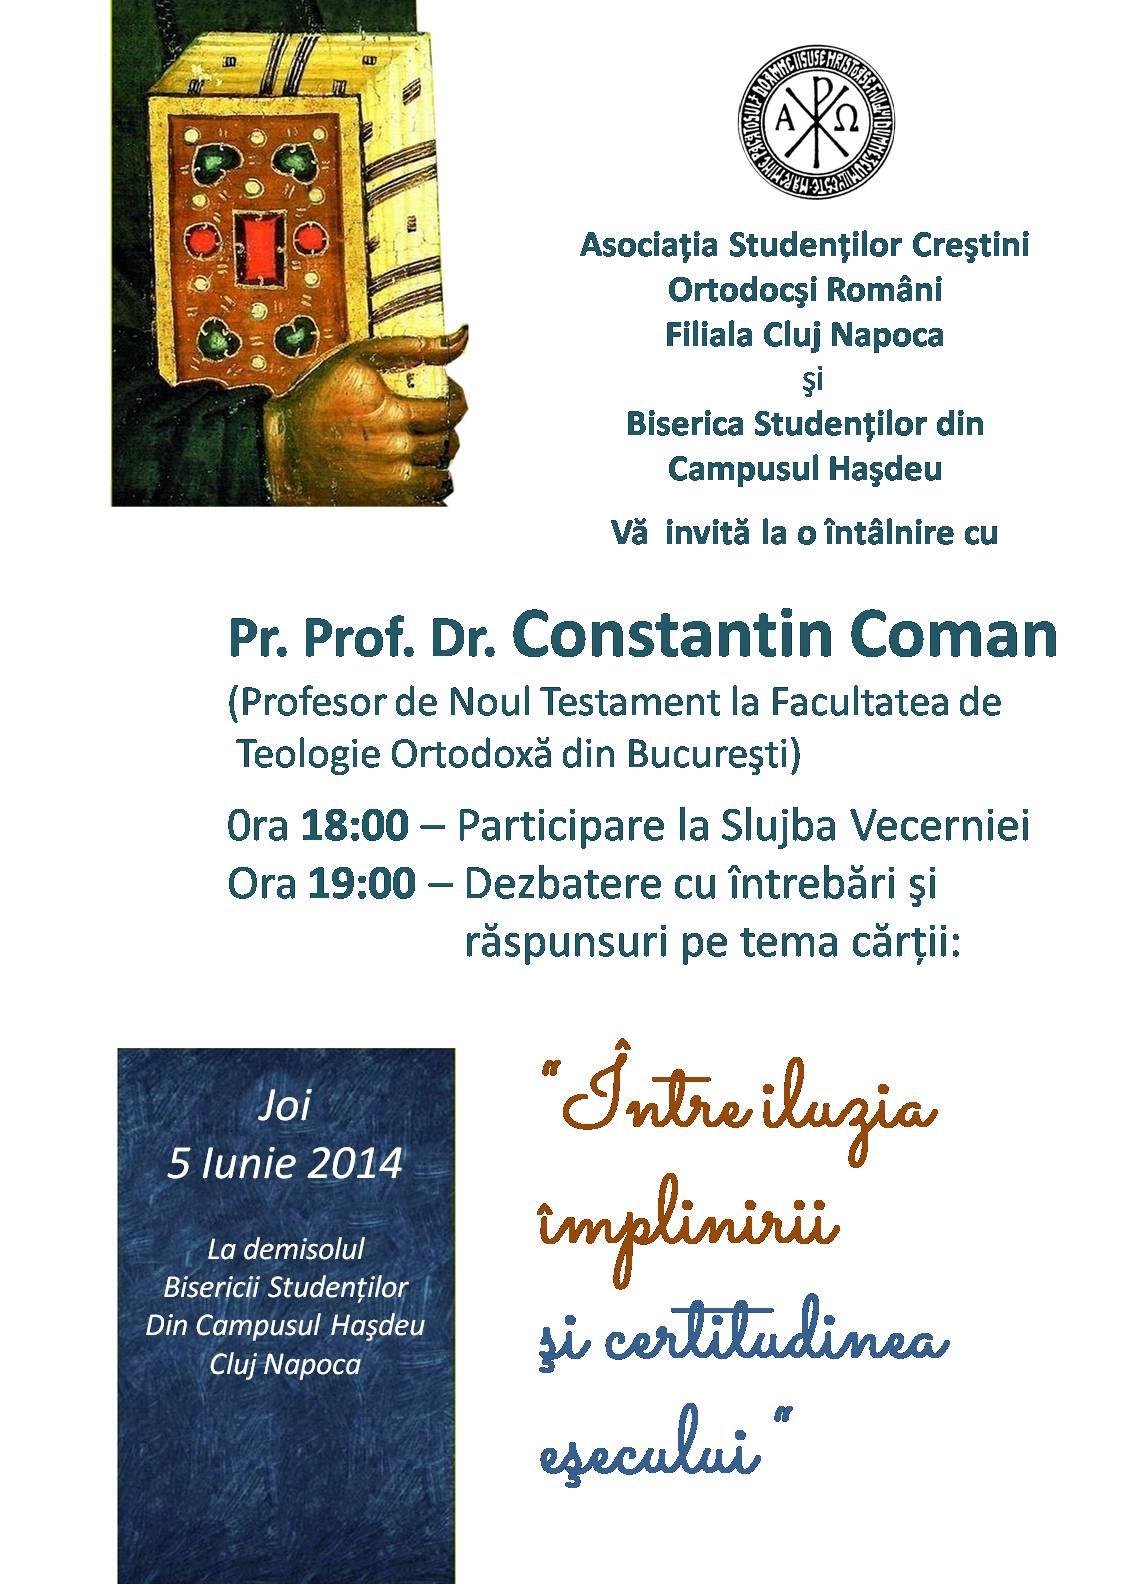 Pr Constantin Coman iunie 2014 3